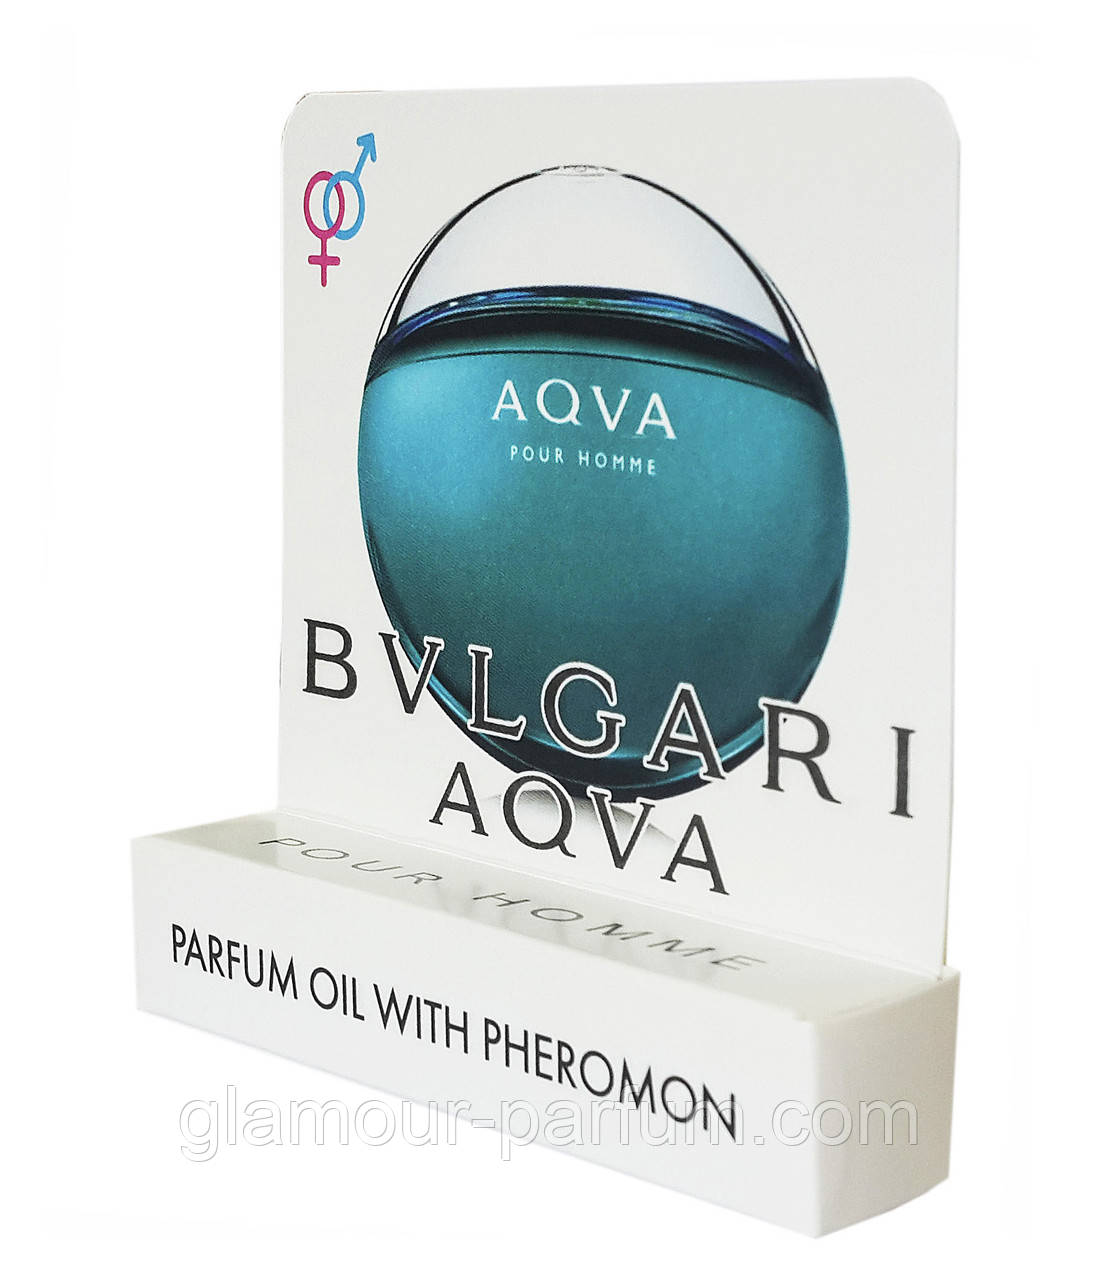 Мини парфюм с феромонами Bvlgari Aqua pour Homme (Булгари Аква Пур Хоум) (реплика)